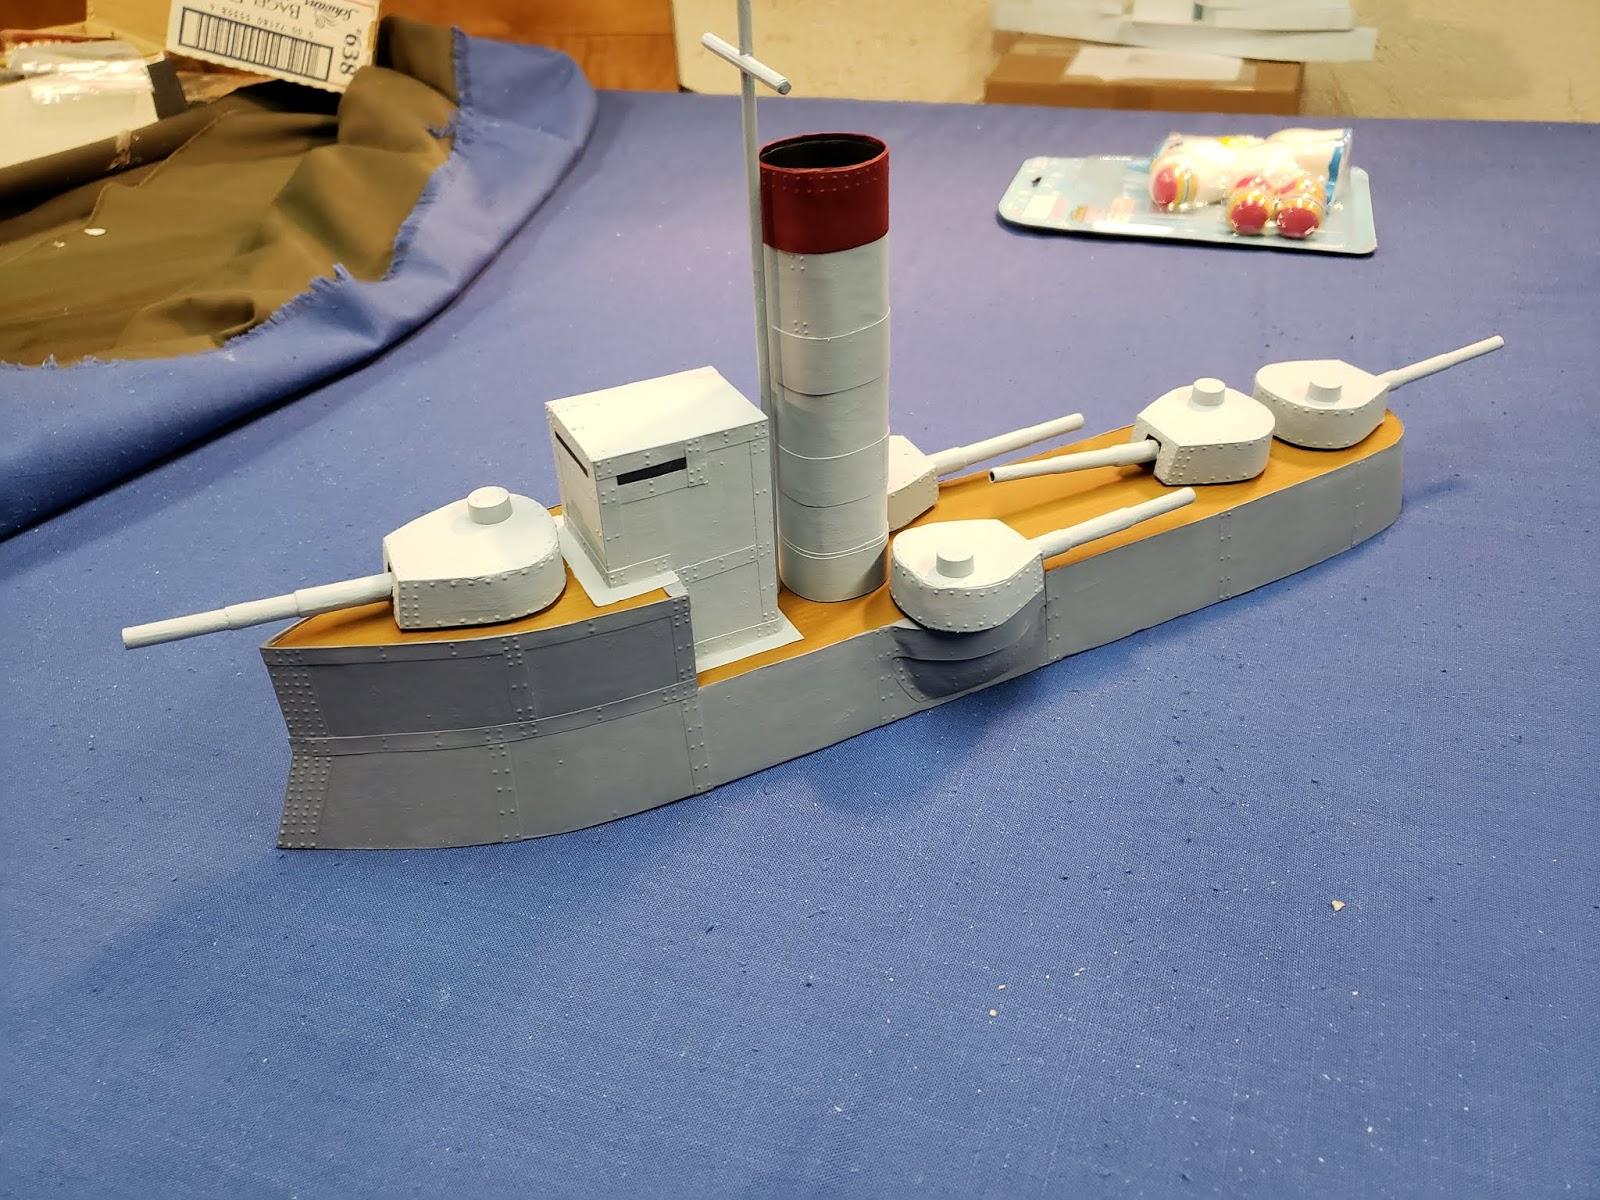 Anton's Wargame Blog: Scratchbuilt Ironclad Cruiser 28mm